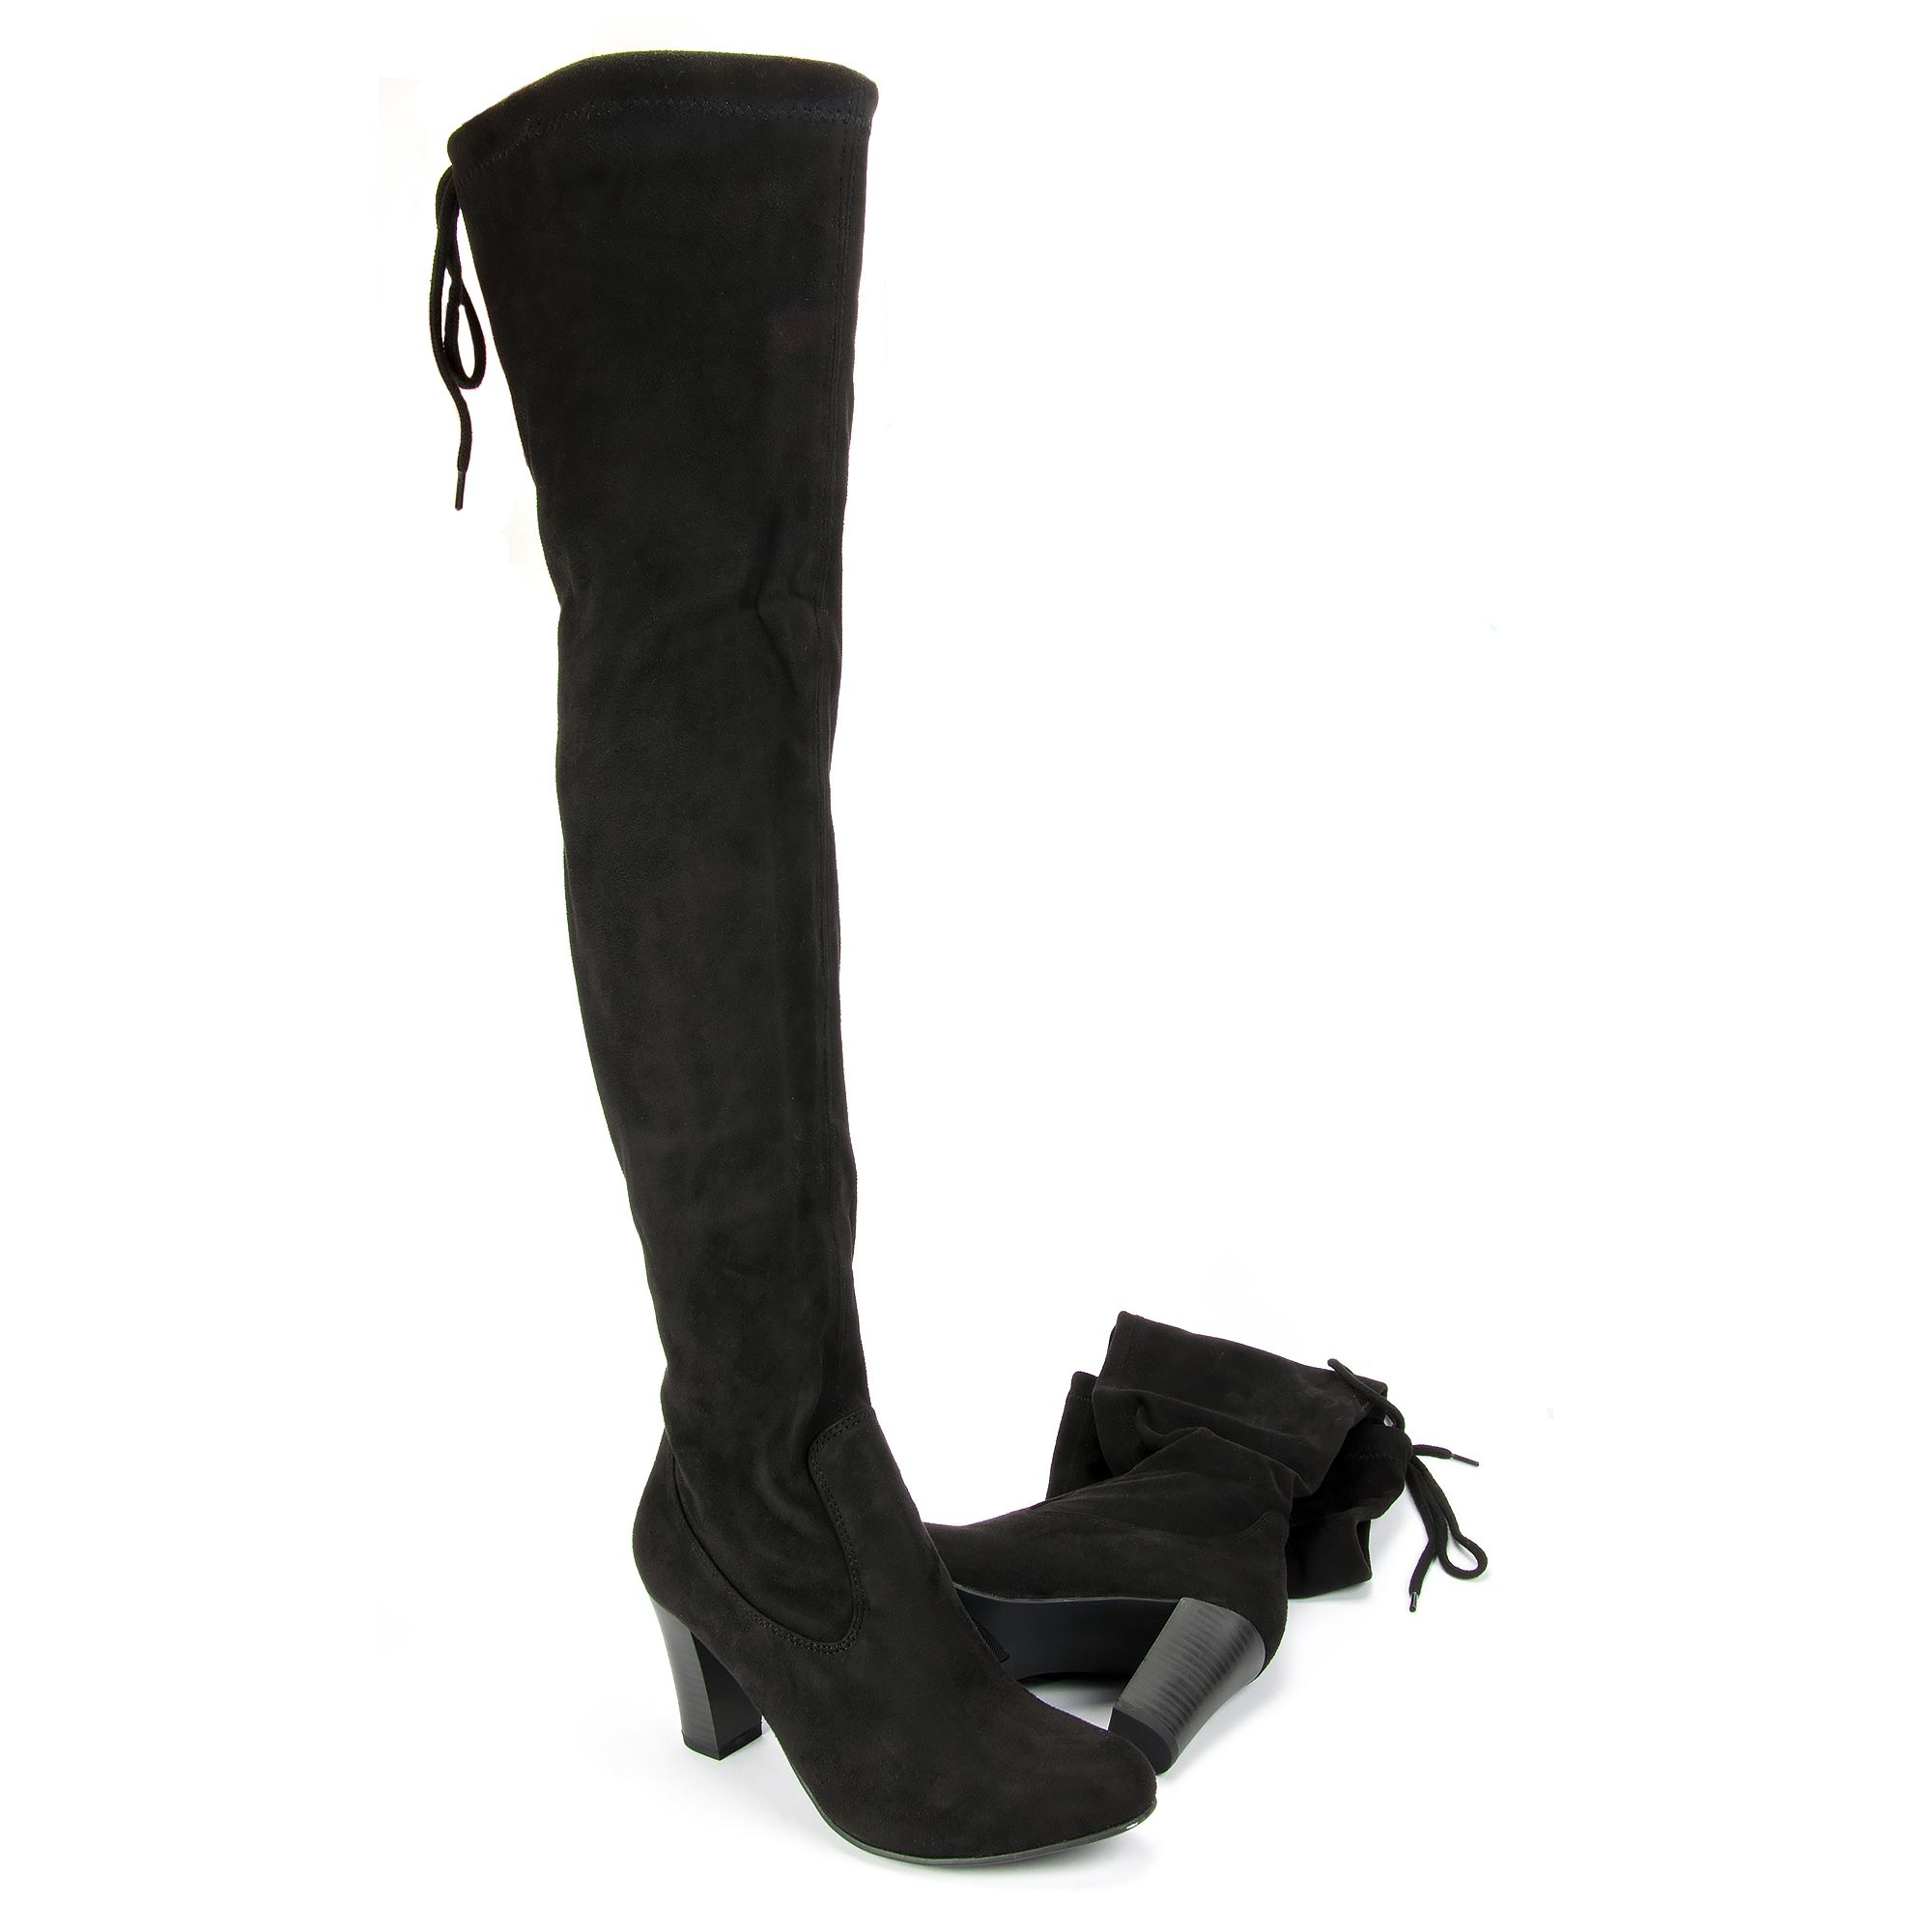 Kozaki Caprice 9 25540 27 001 Black 8024722 Kozaki Na Obcasie Kozaki Buty Damskie Filippo Pl Boots Knee Boots Shoes